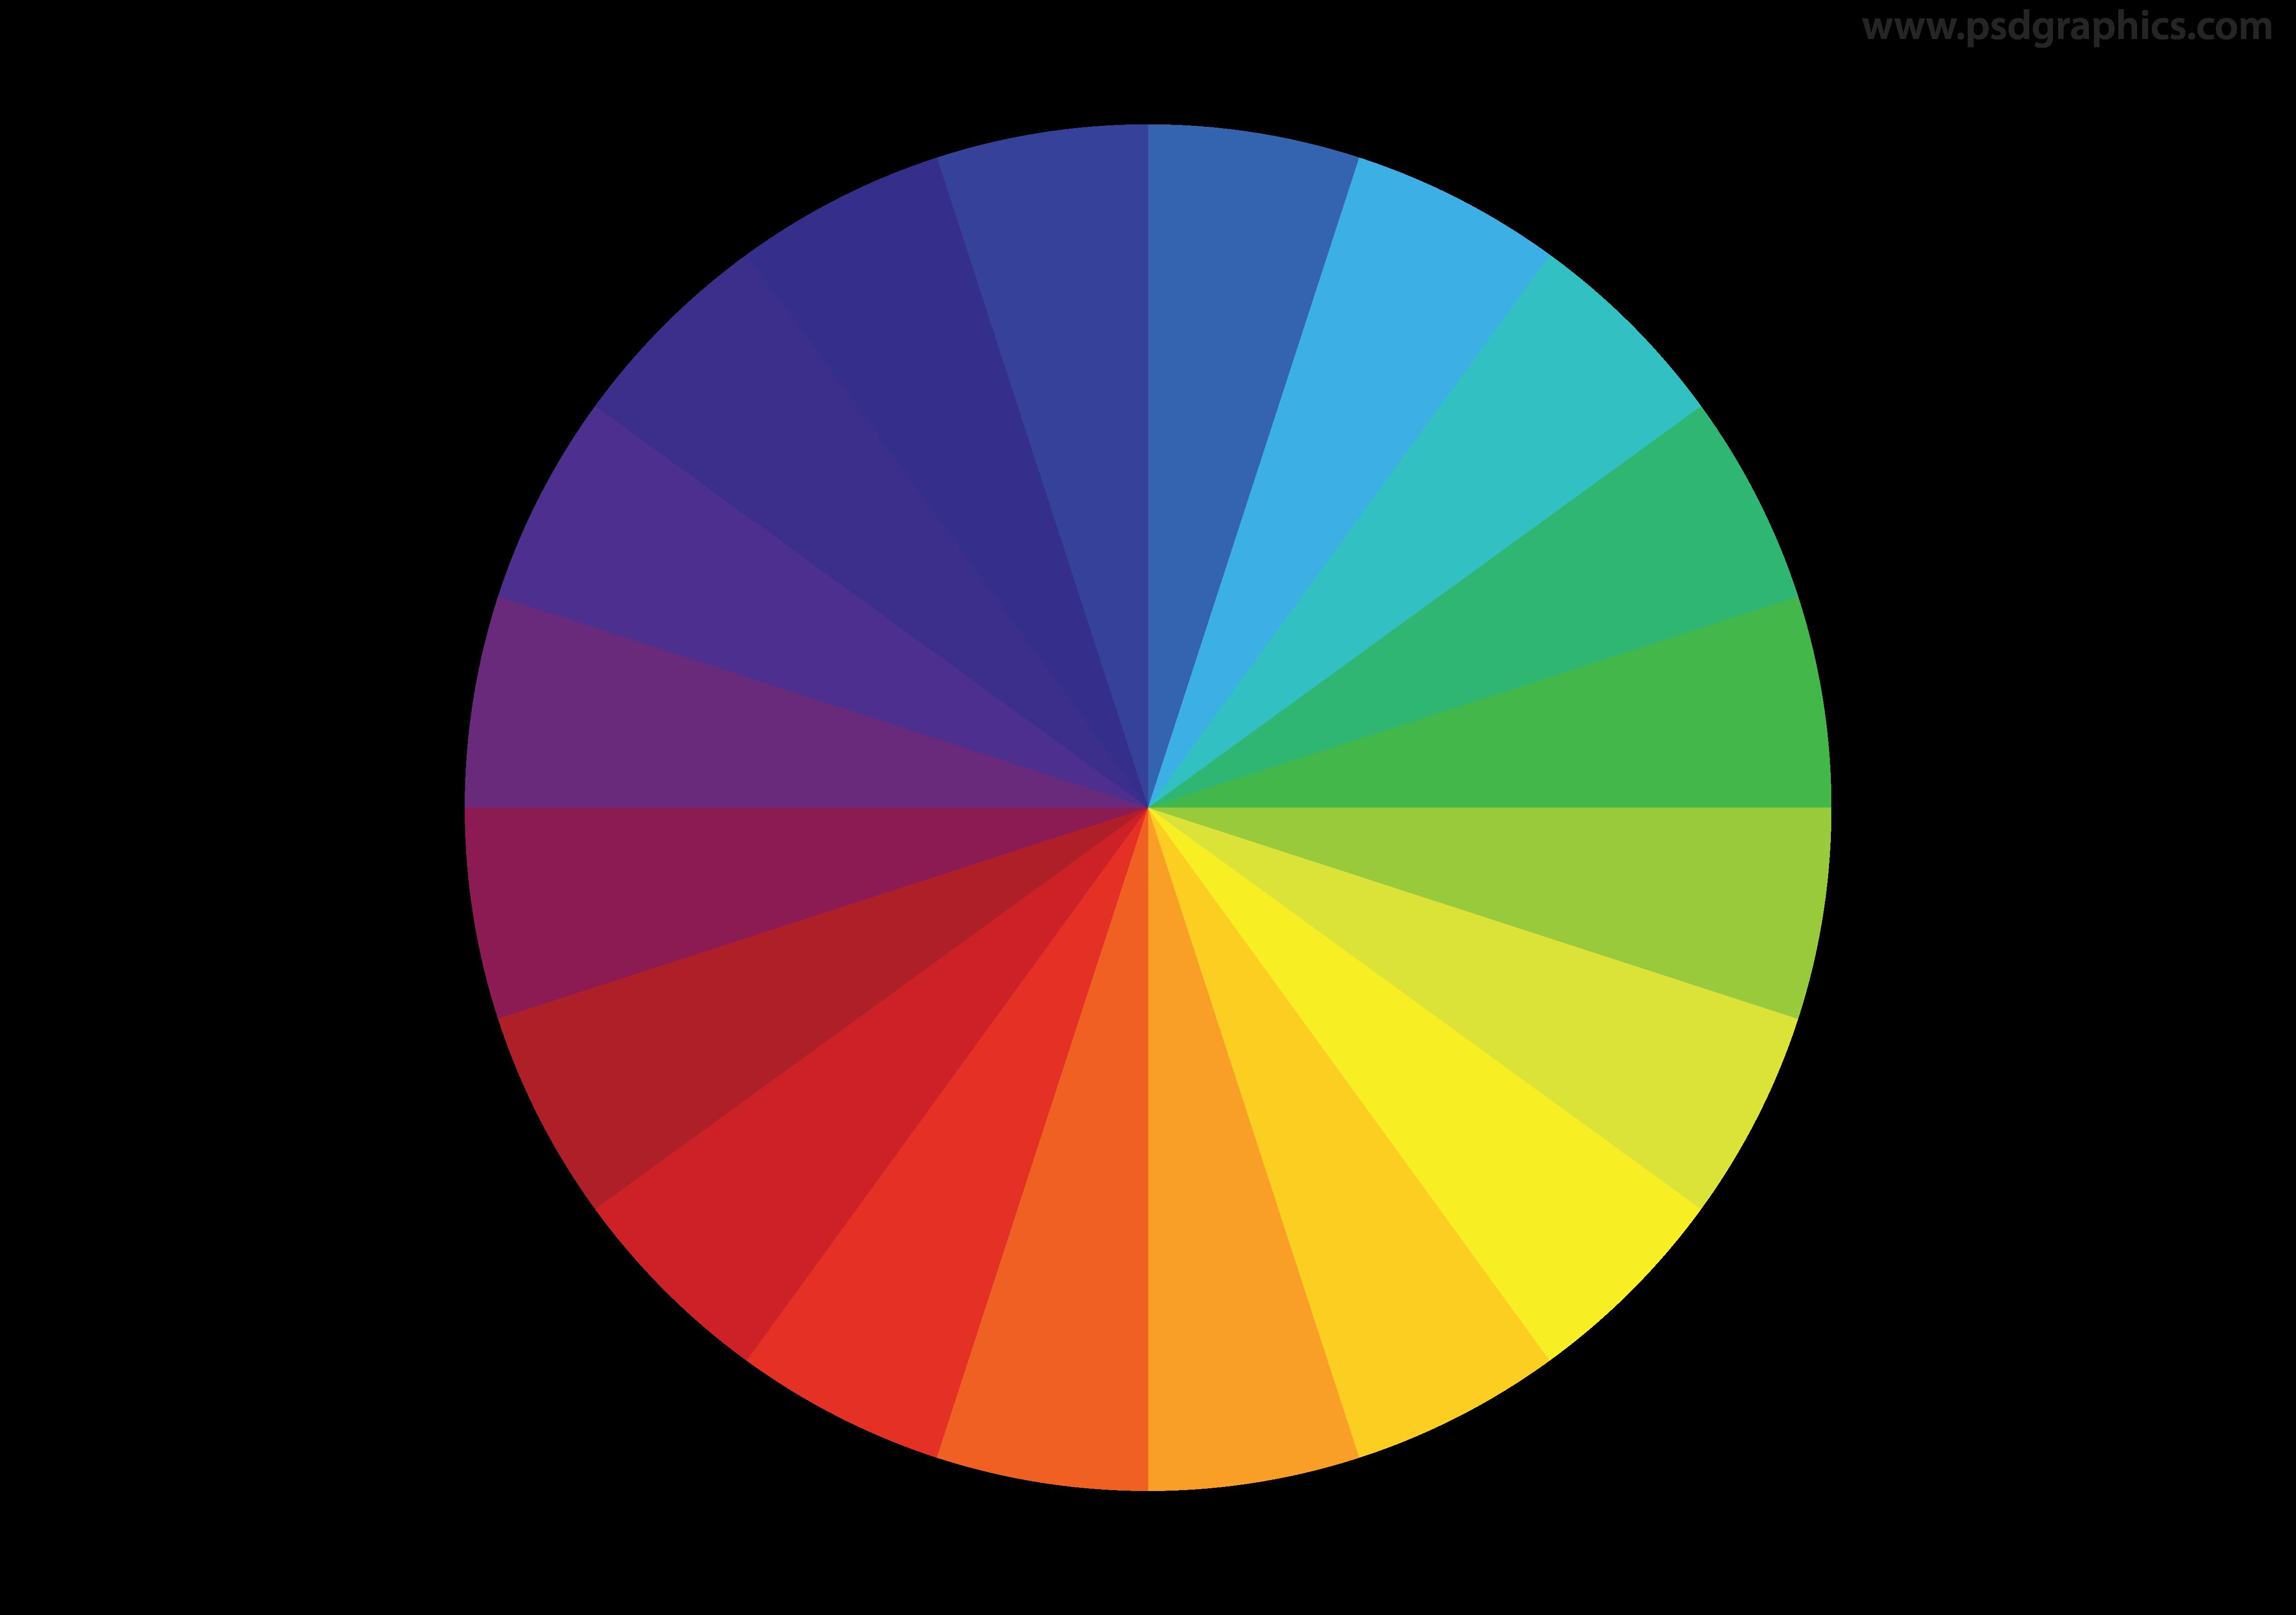 Color clipart color wheel. Vector psdgraphics